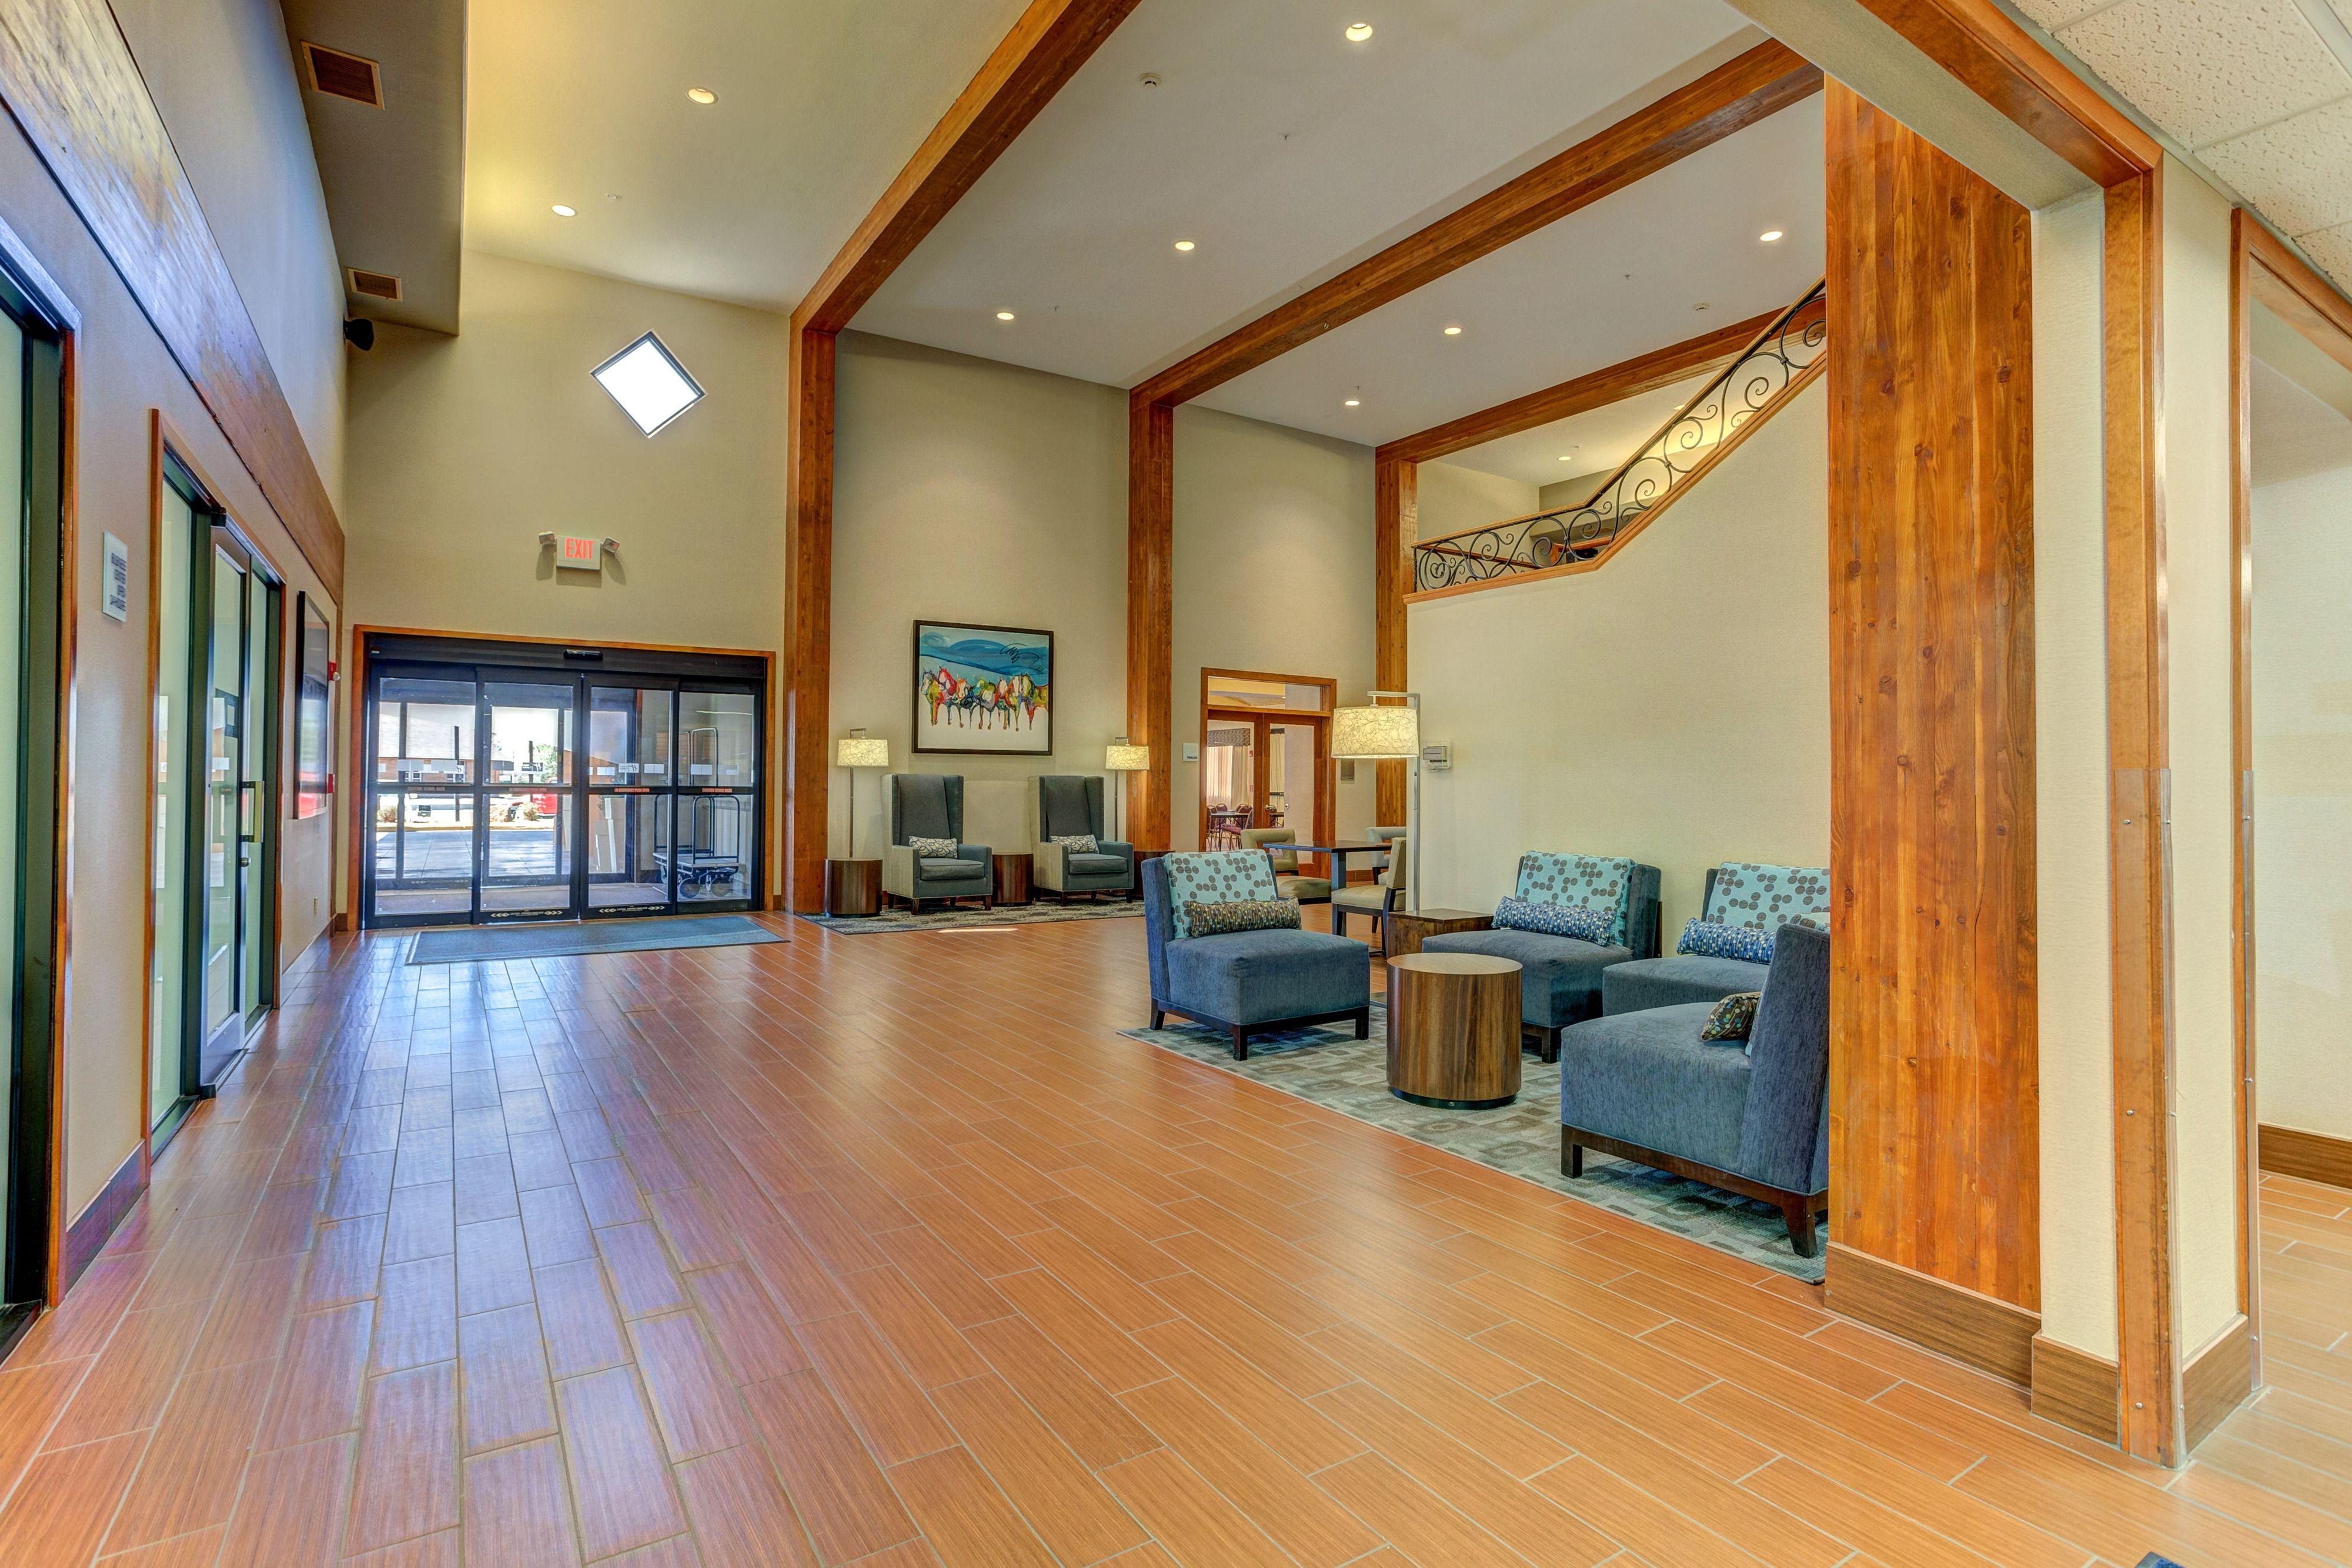 Holiday Inn Express & Suites Montrose image 5